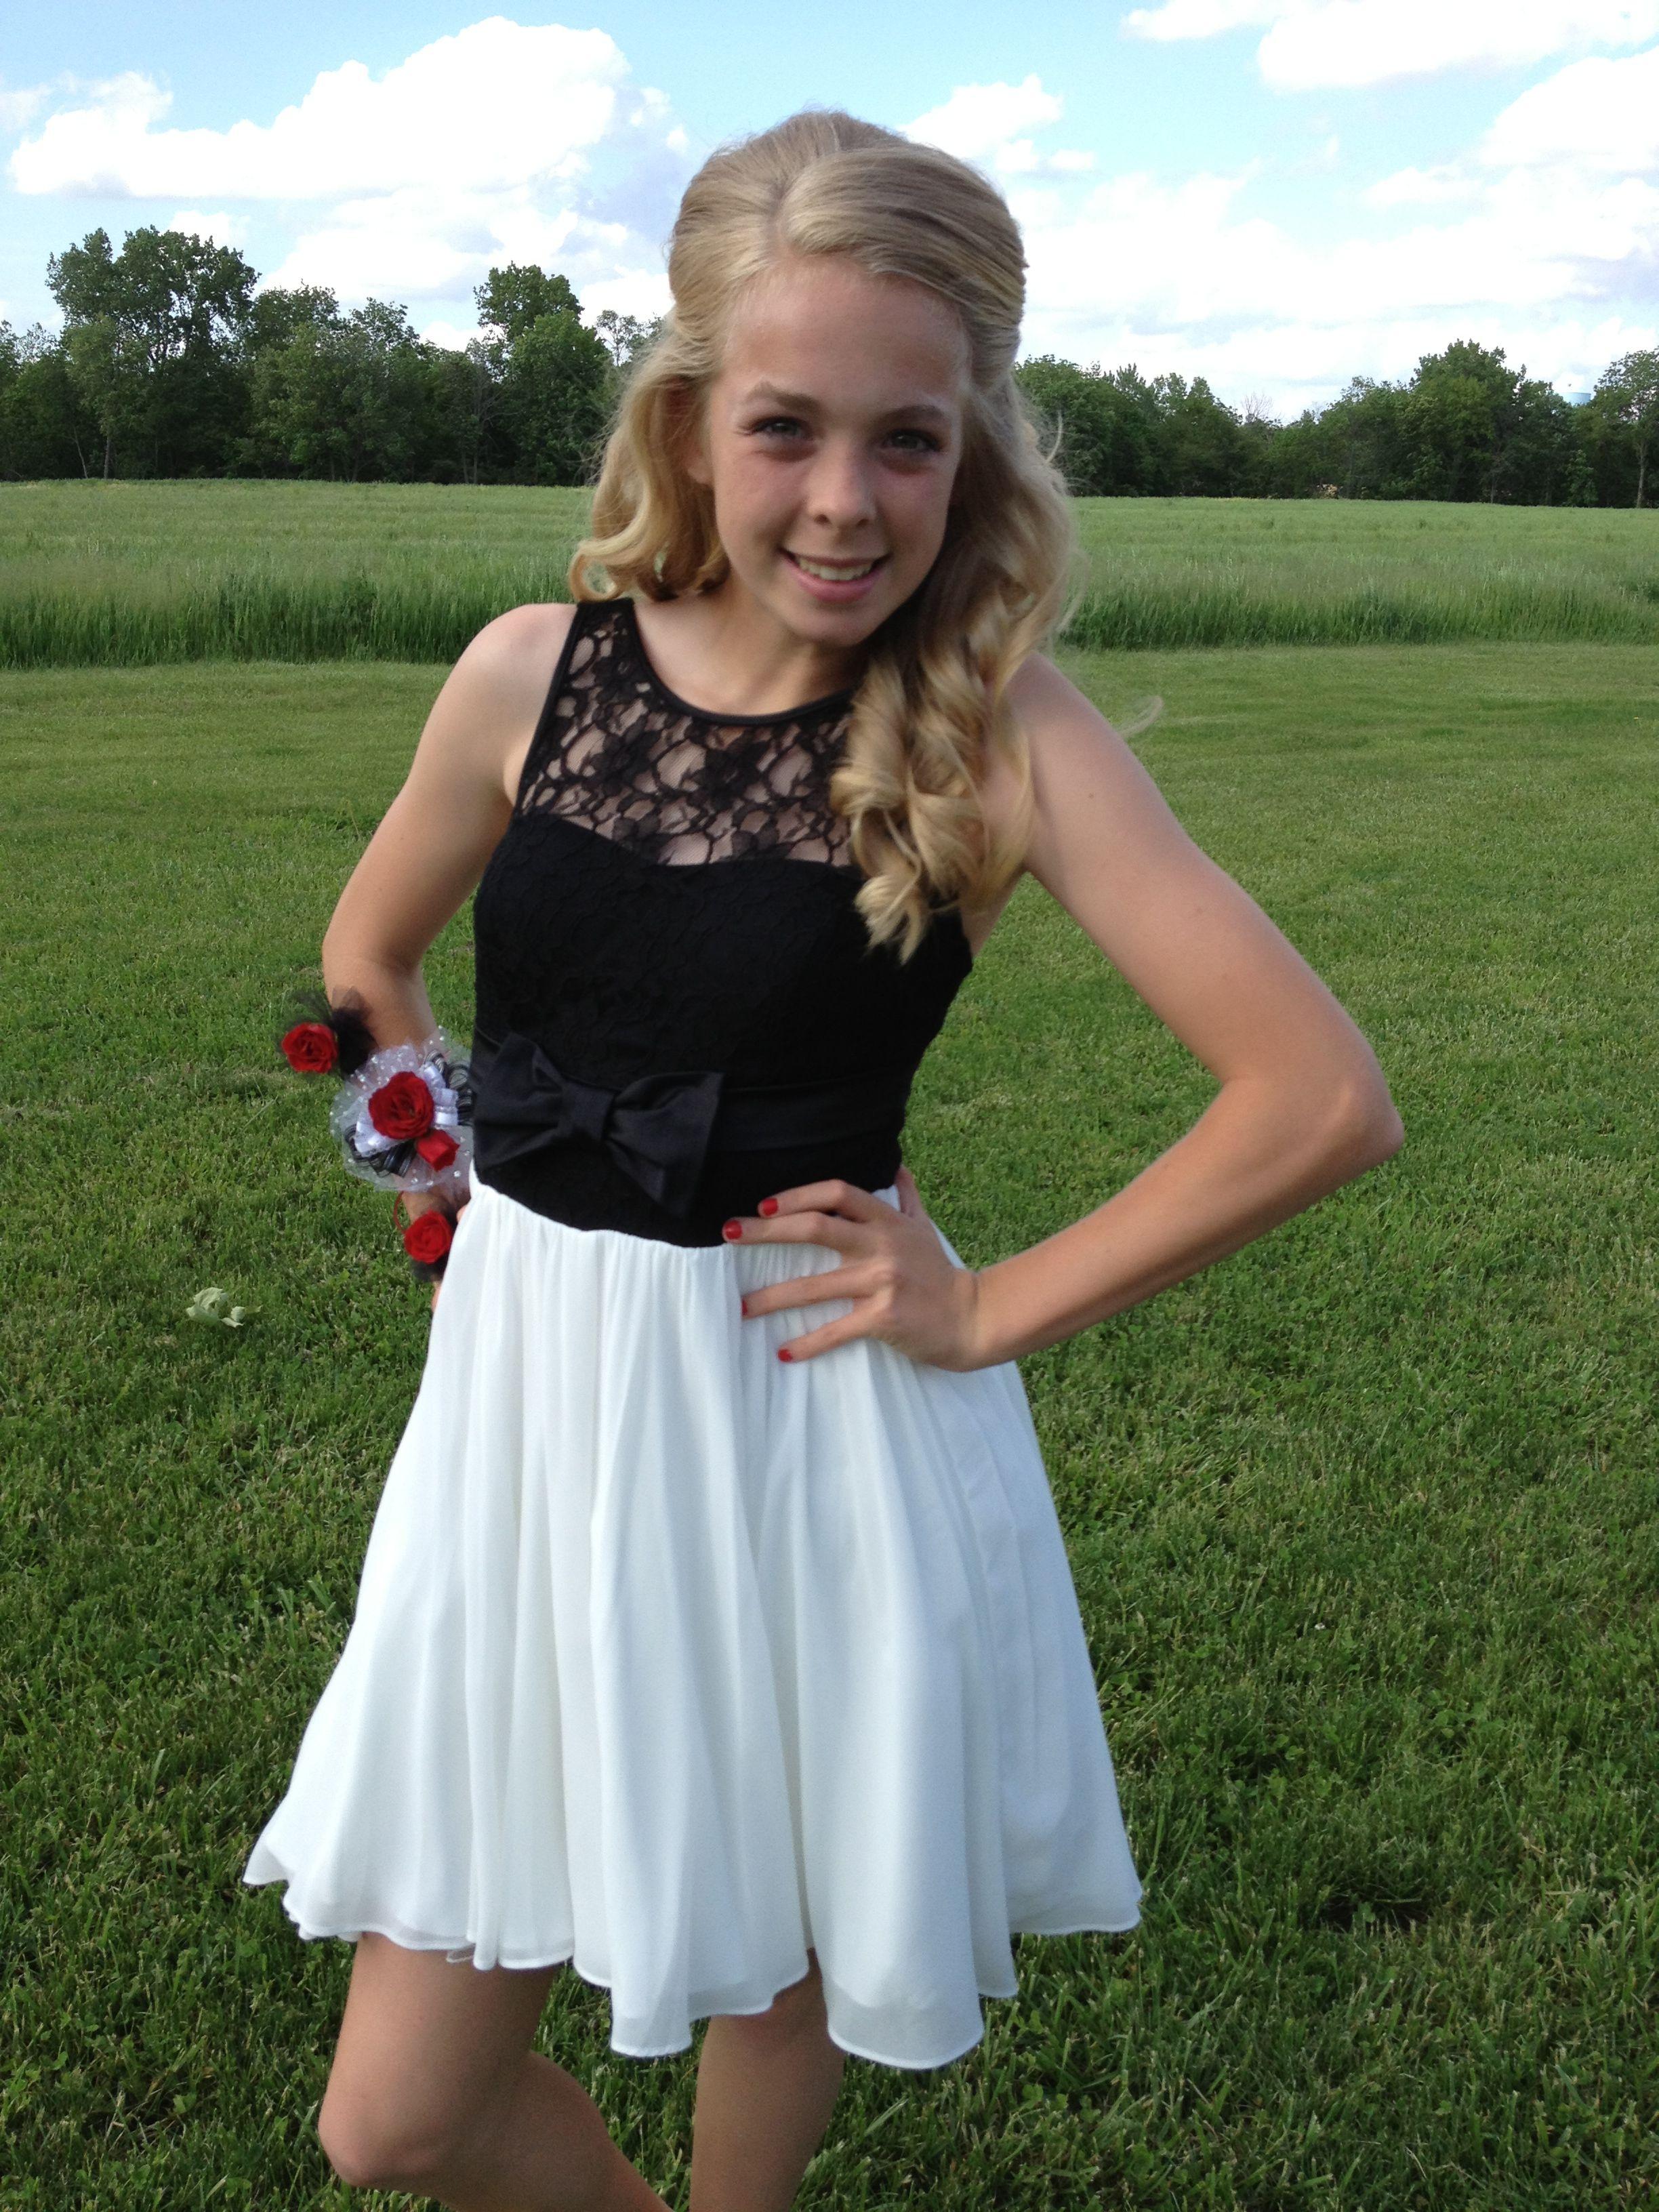 graduation/prom dresses edmonton